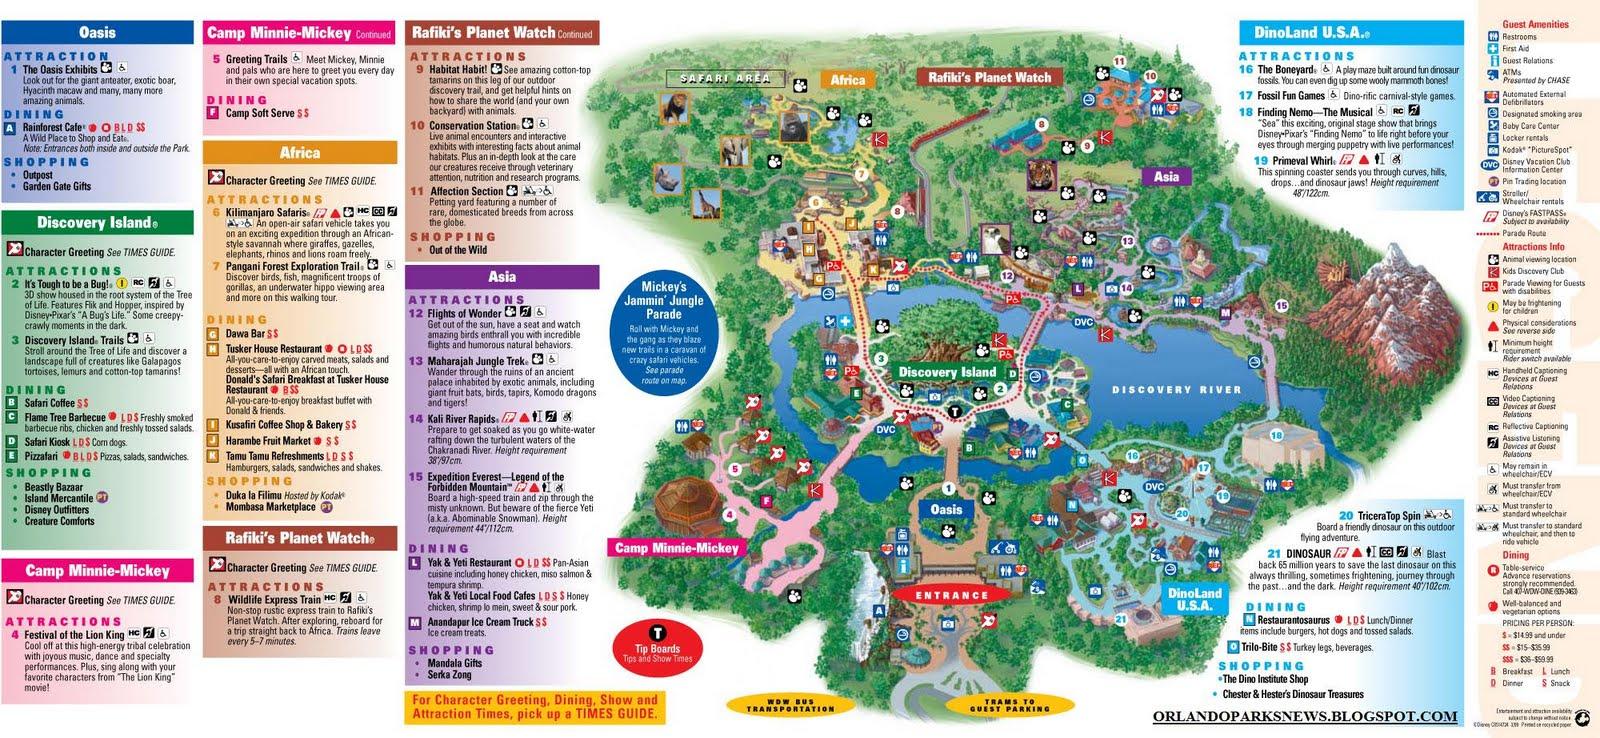 Orlando Theme Park News: Disney's Animal Kingdom park map